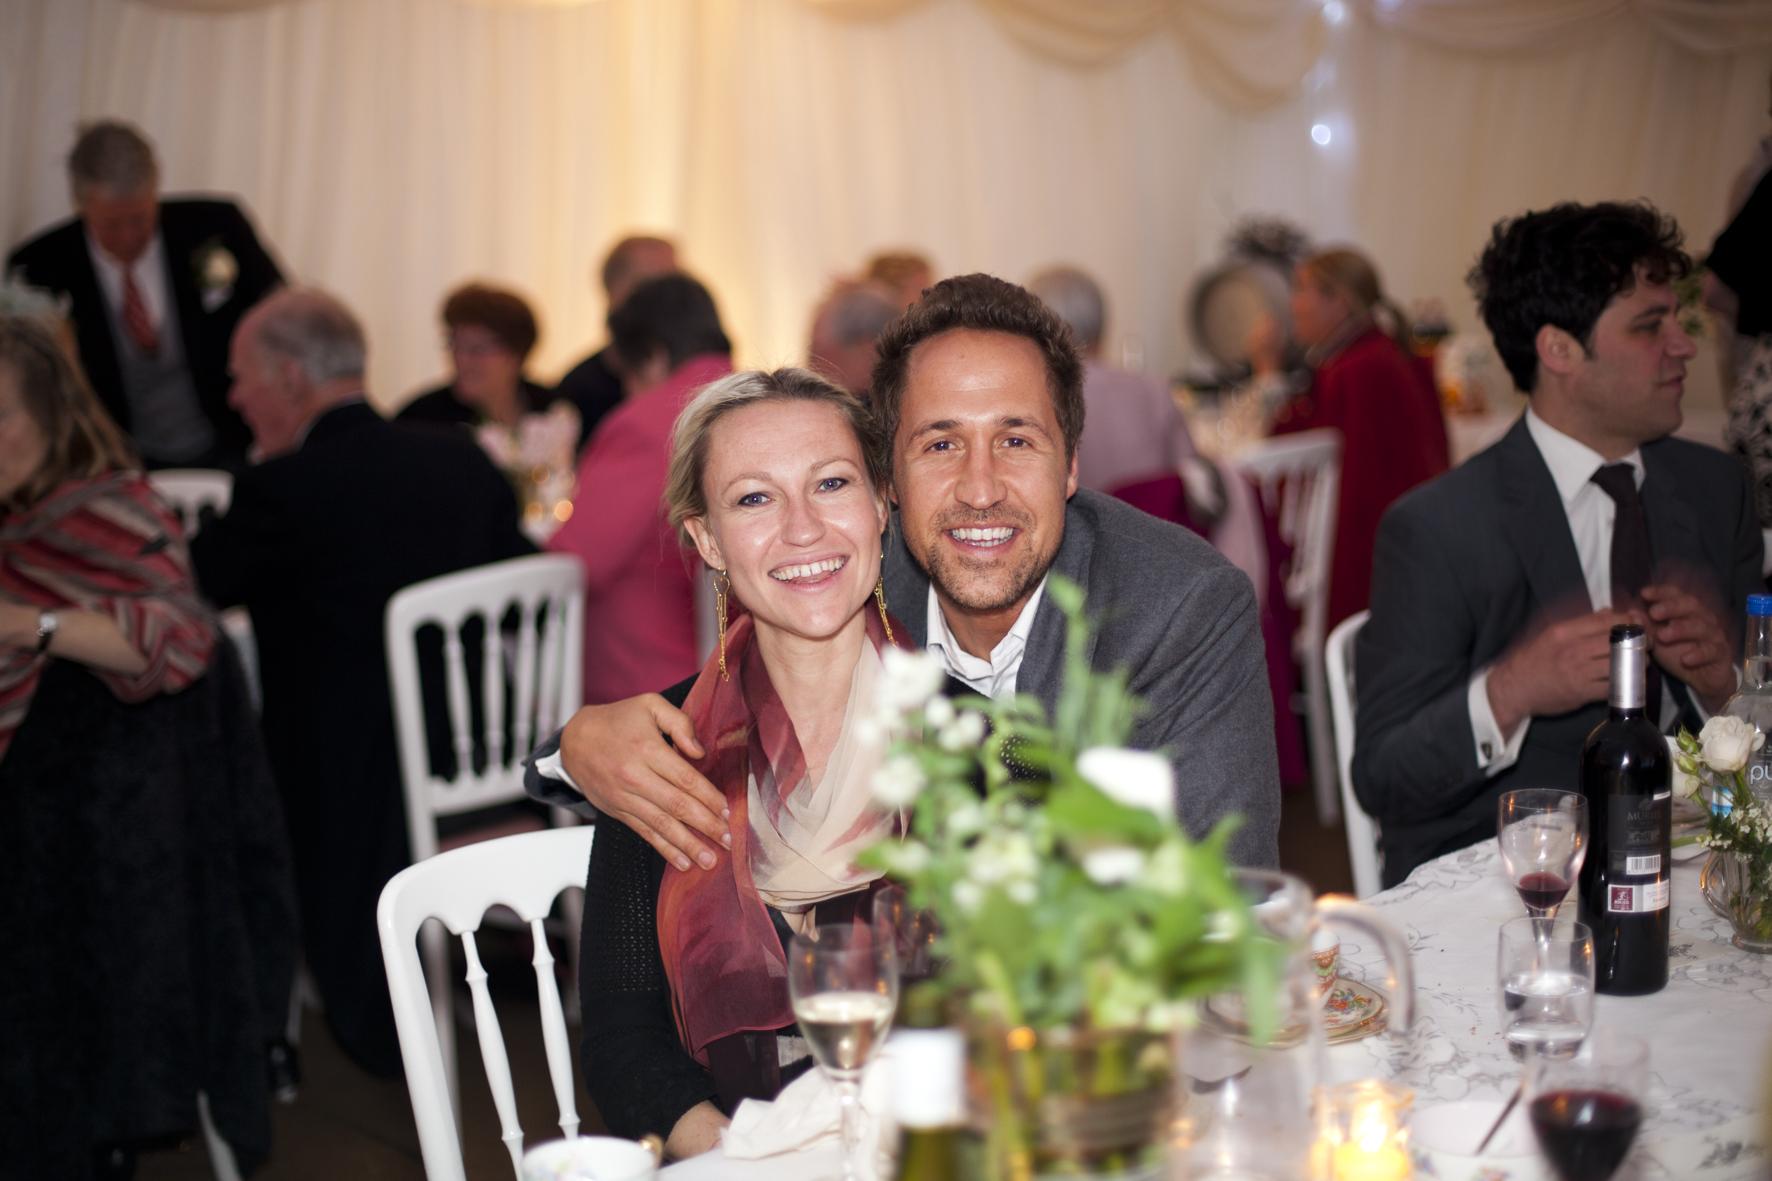 Wedding example_M&P__MG_4275_Claudia Leisinger.jpg